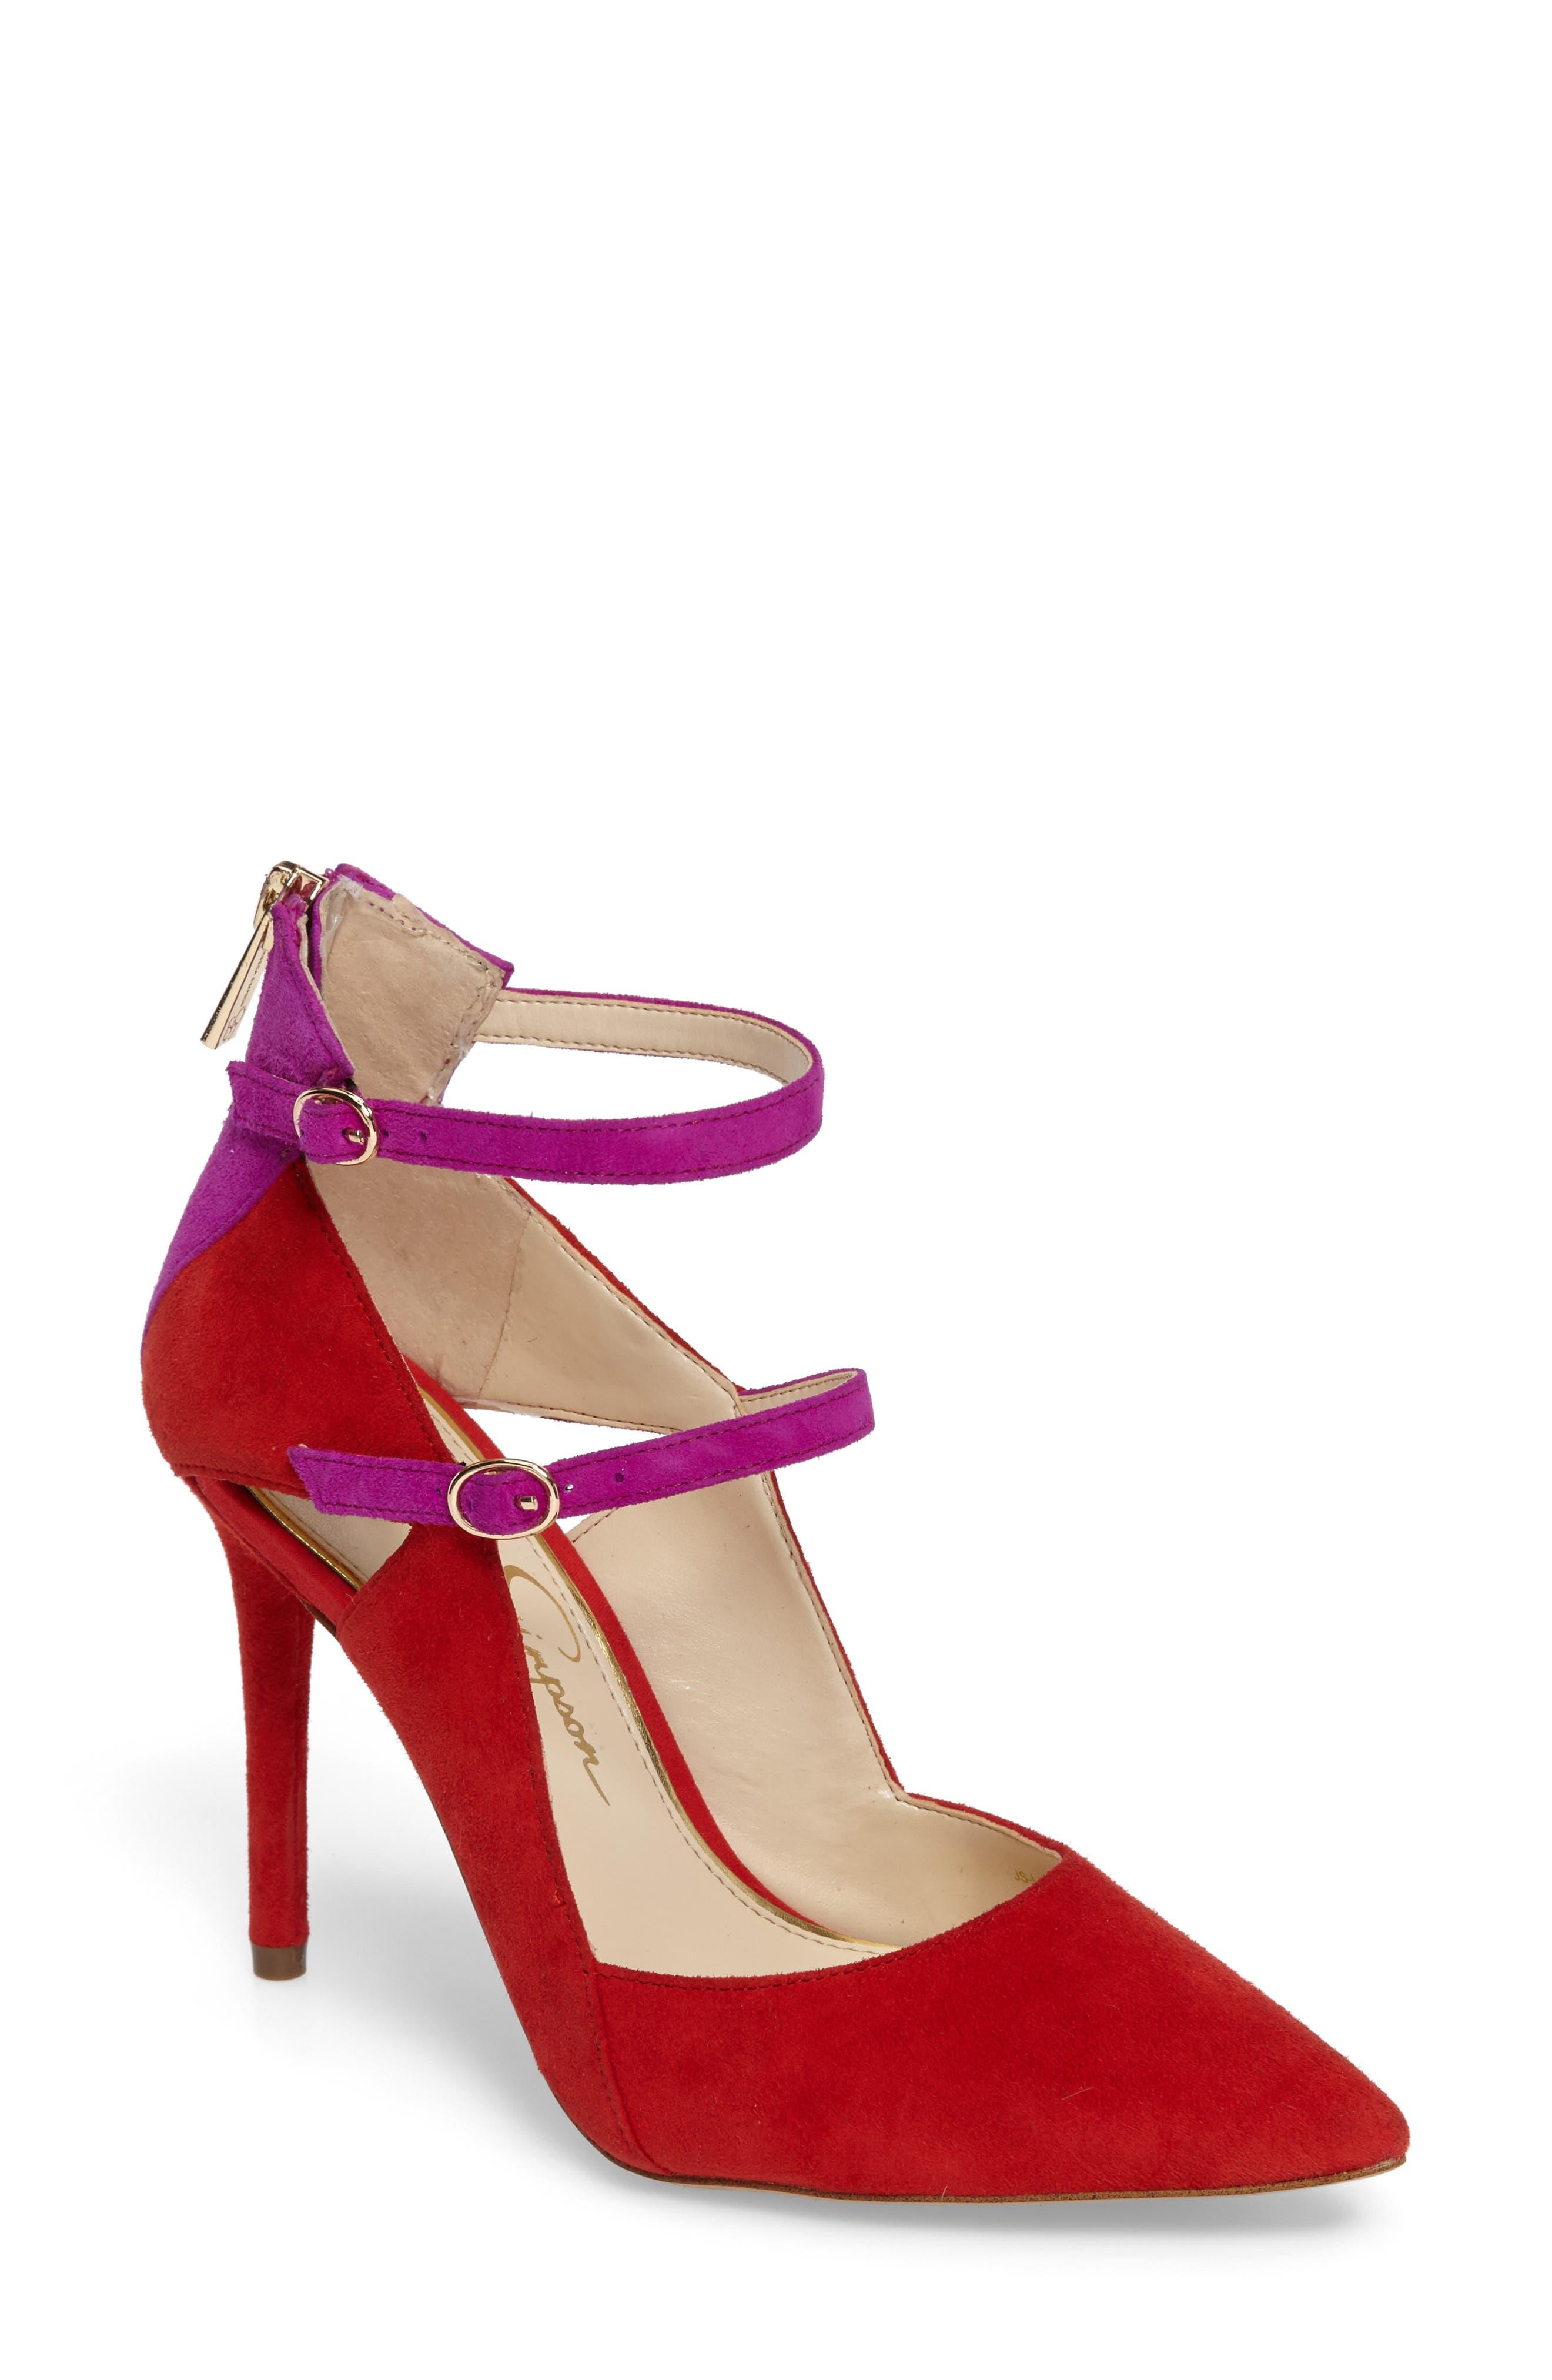 Liviana Pointy-Toe Pump,                         Main,                         color, Red Muse Com